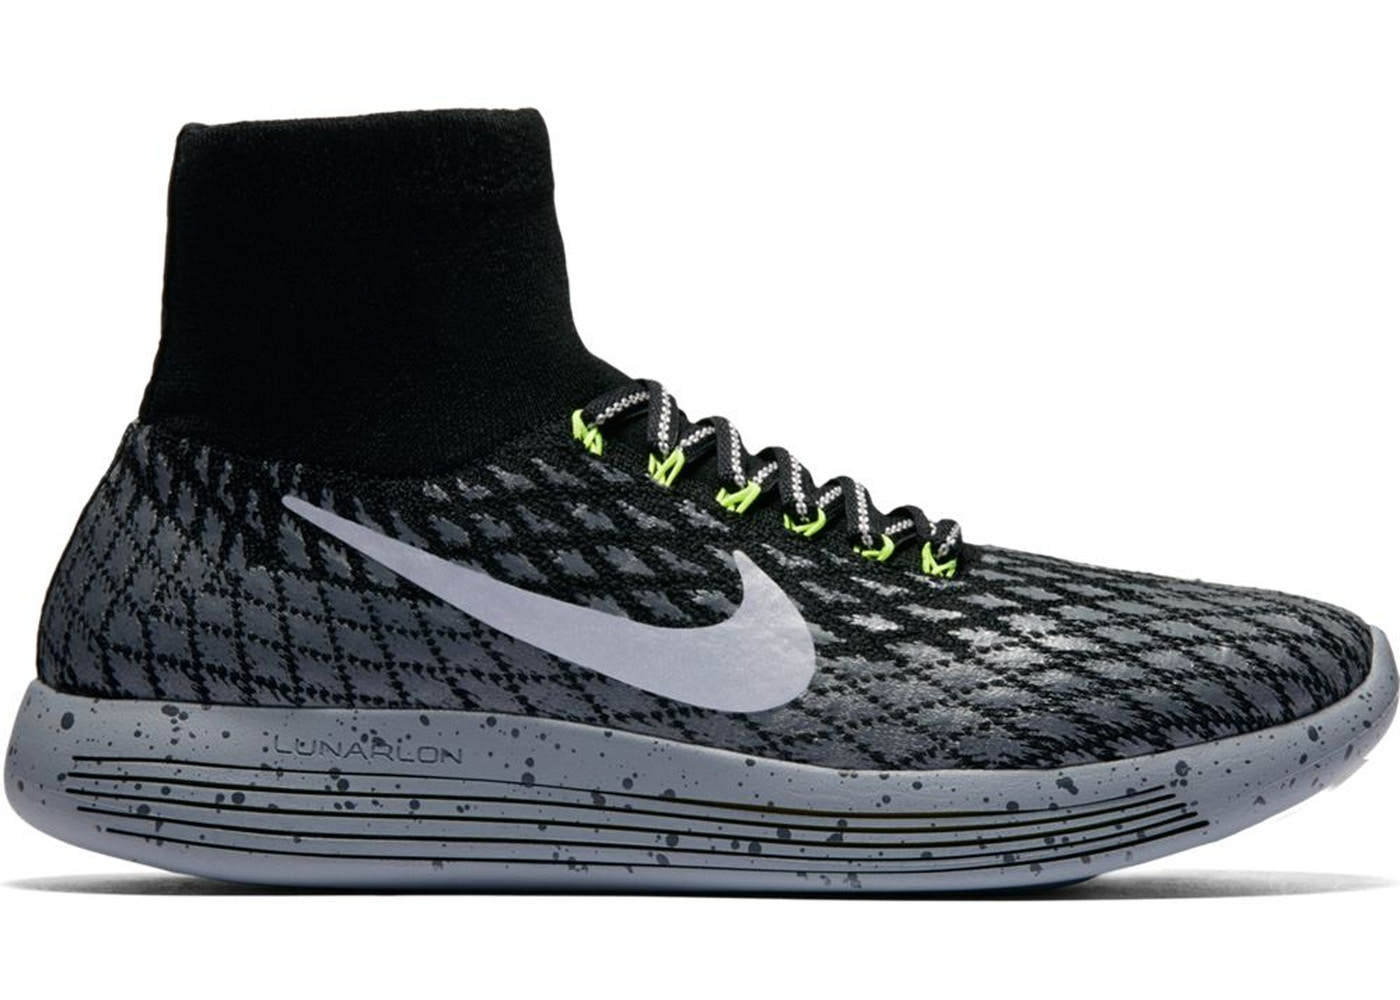 separation shoes 4a51f 257ea Nike Lunarepic Flyknit Shield Black Silver Volt (W)